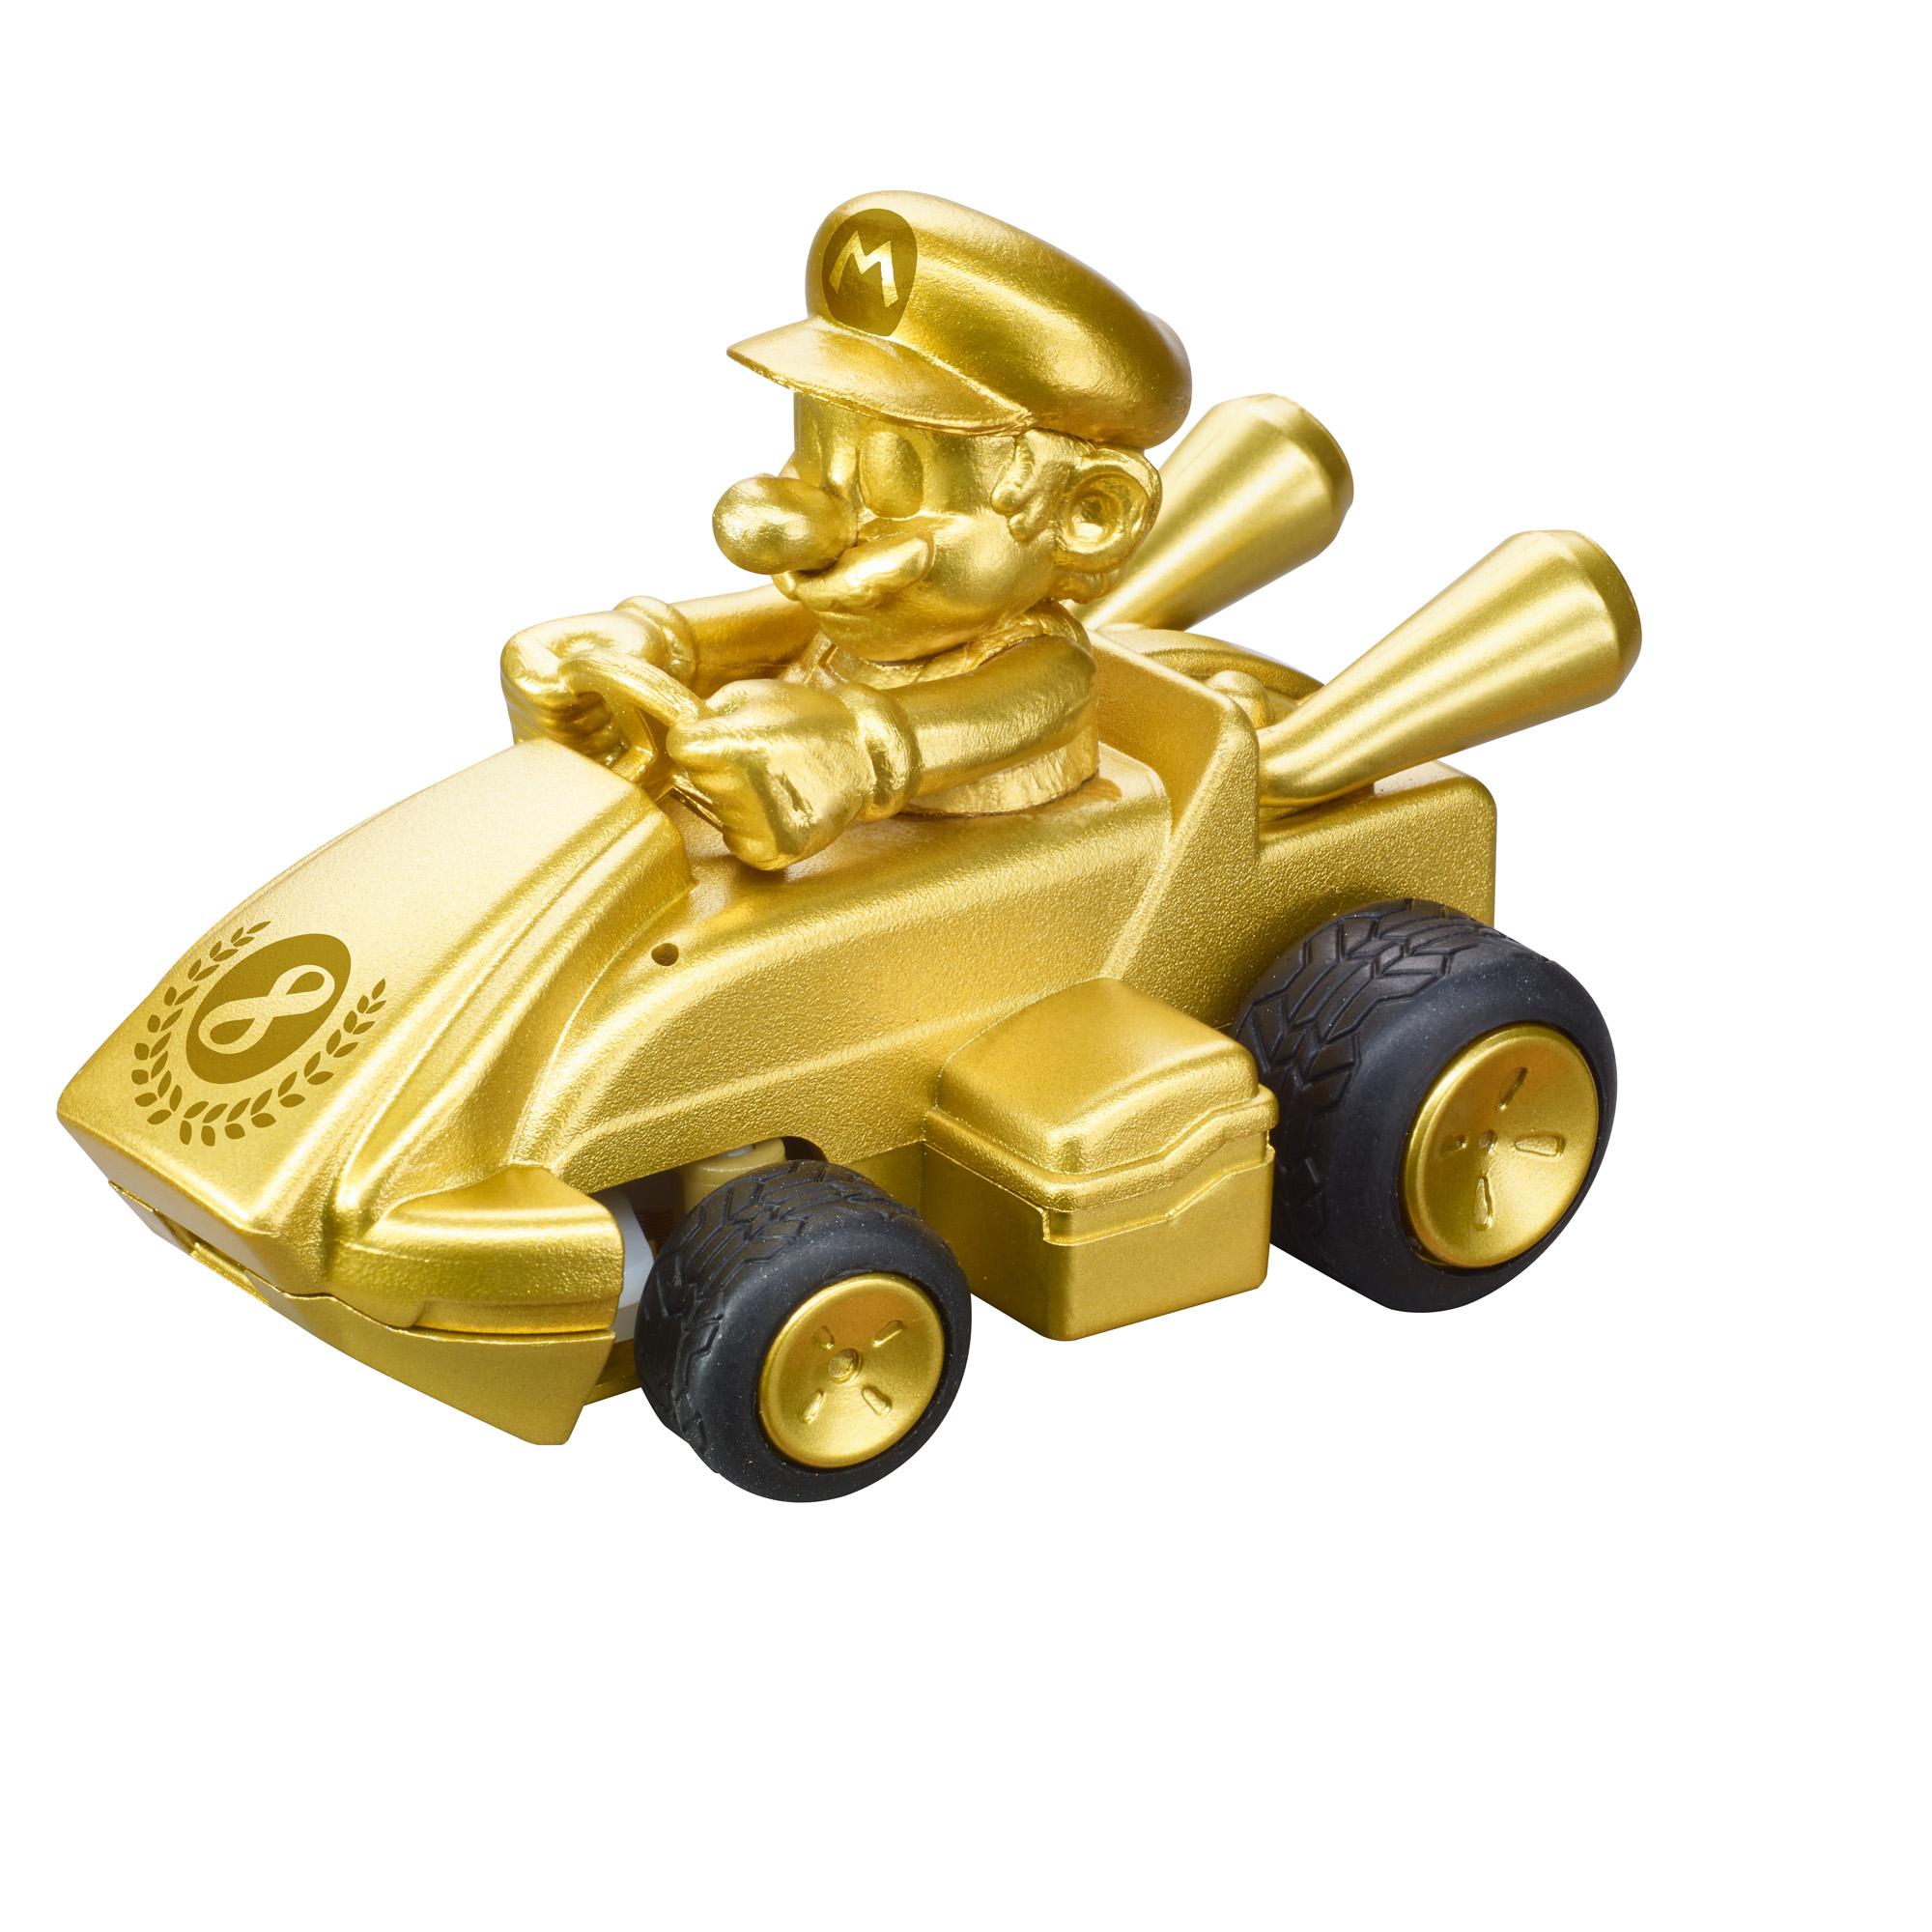 Carrera - Nintendo 2,4GHZ RC Super Mario Mini - Mario Gold (370430001)